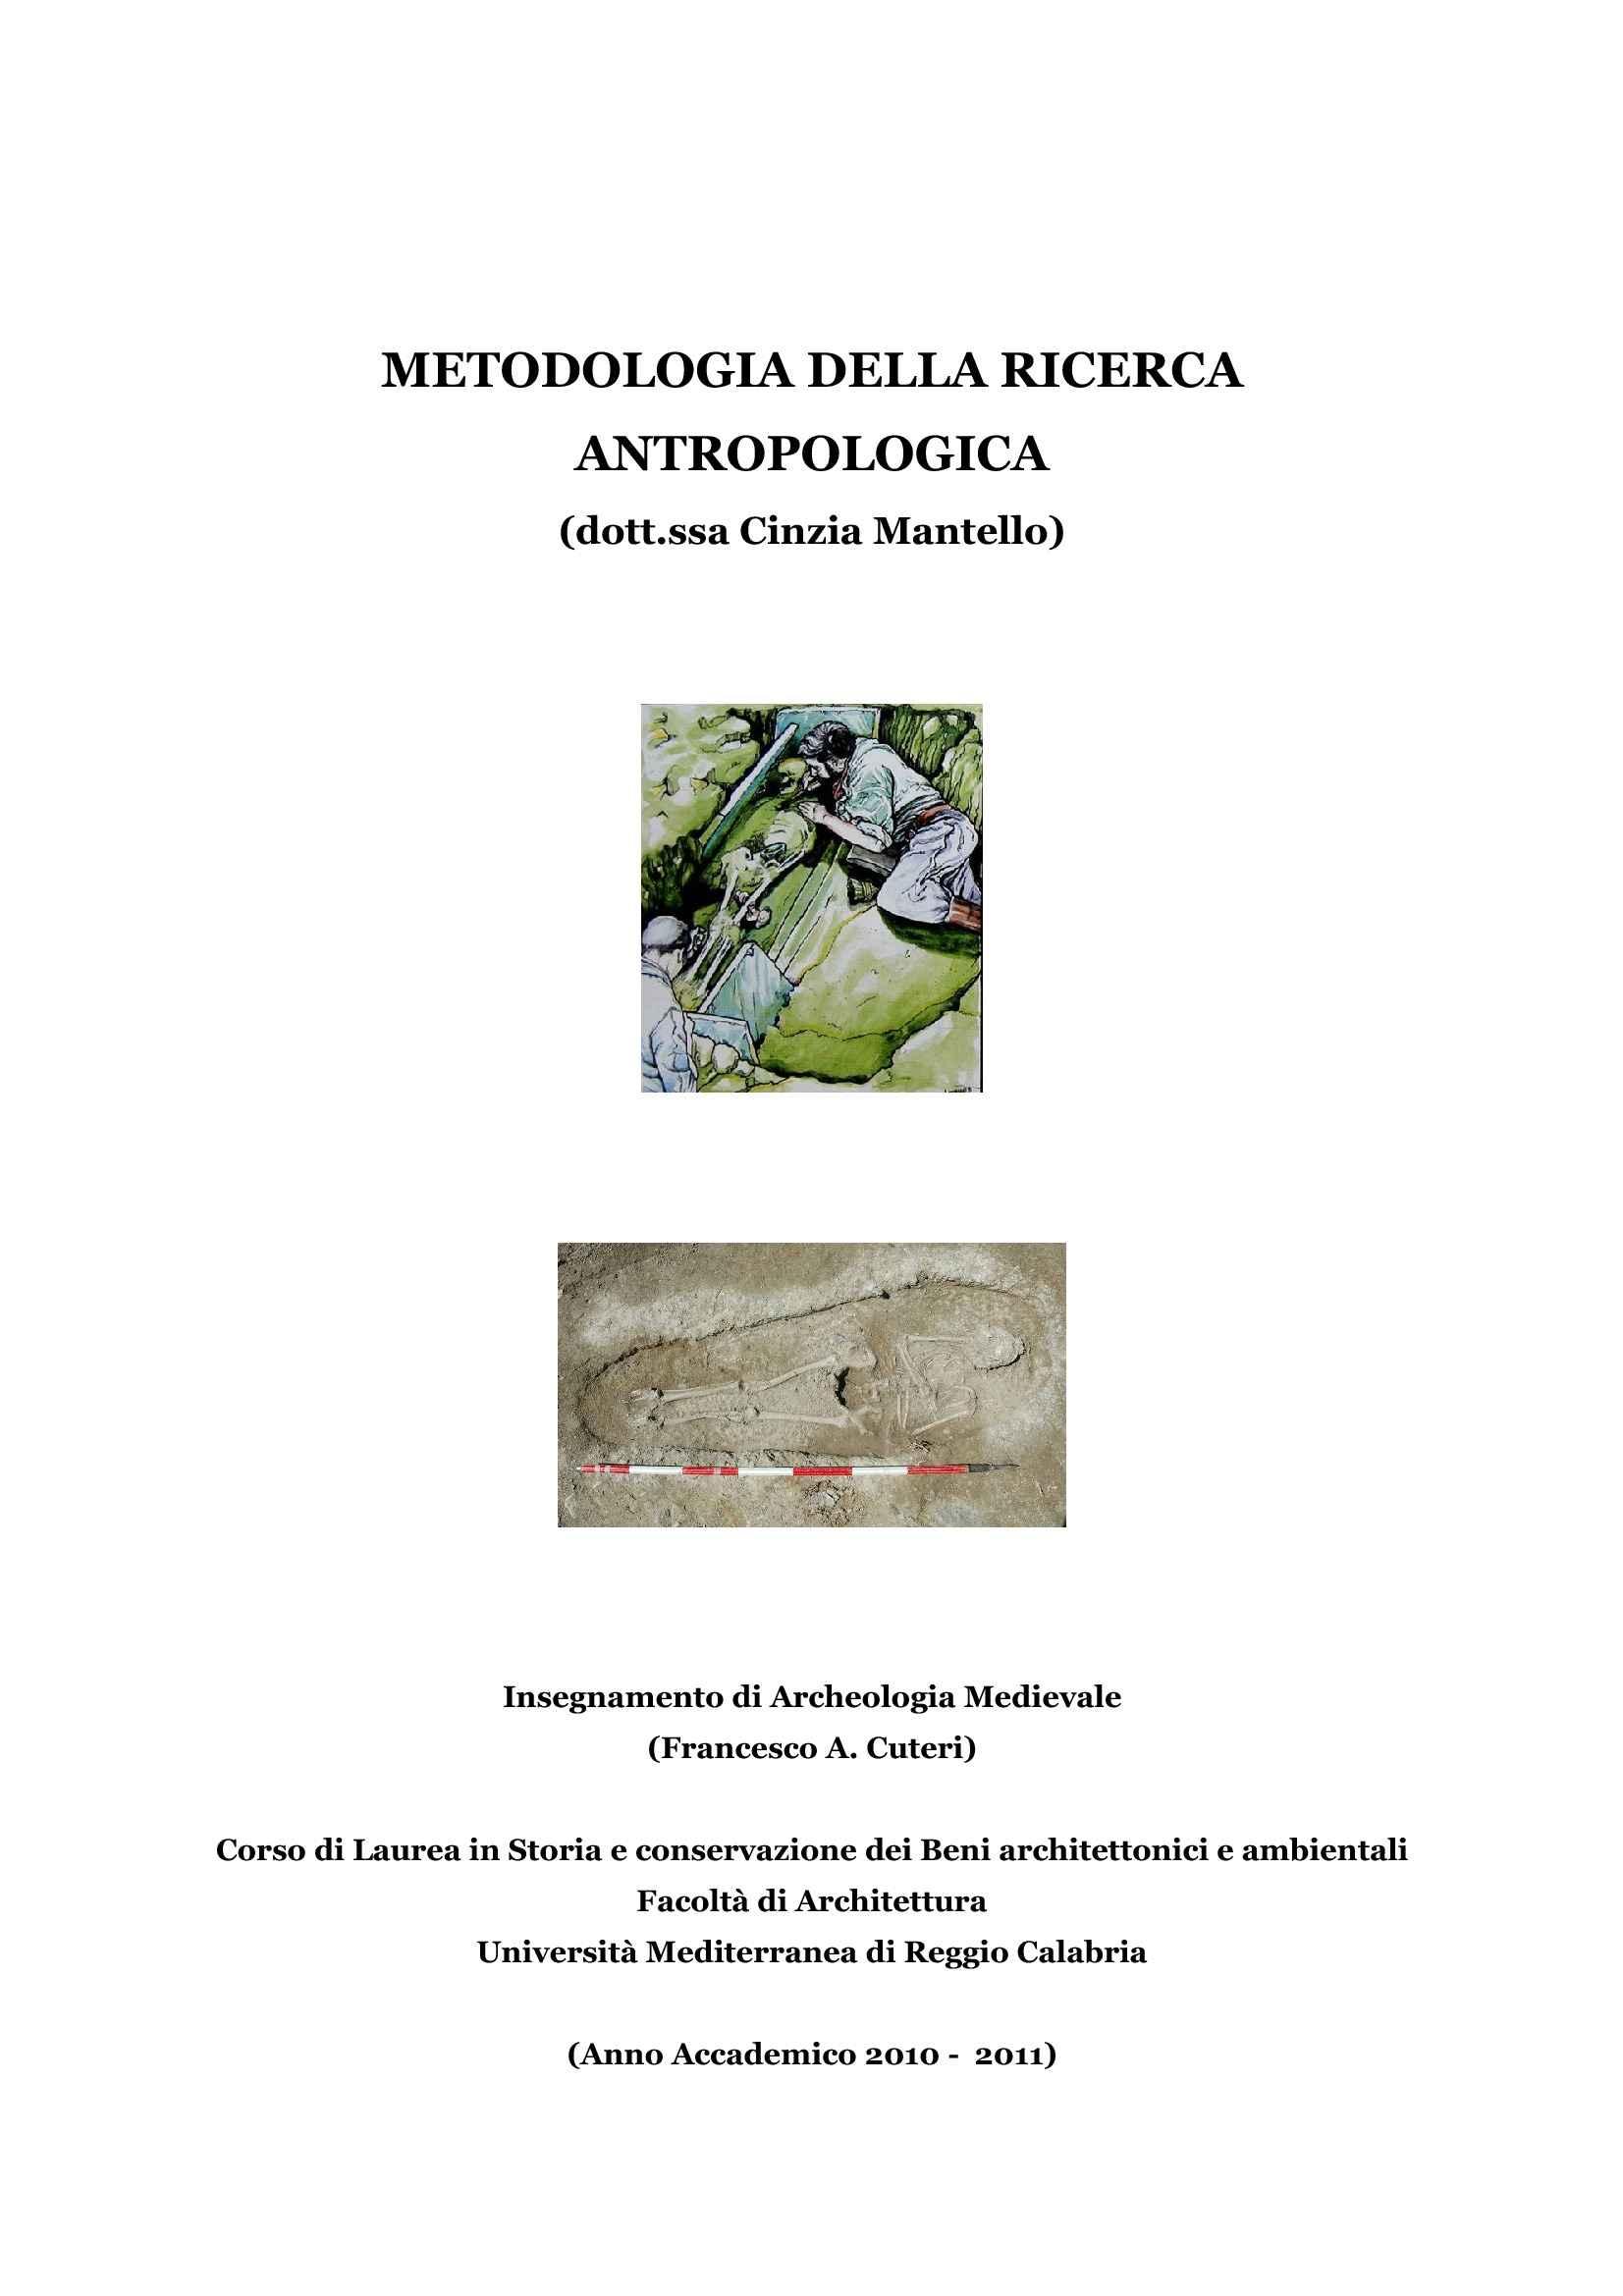 Ricerca antropologica - Metodologia